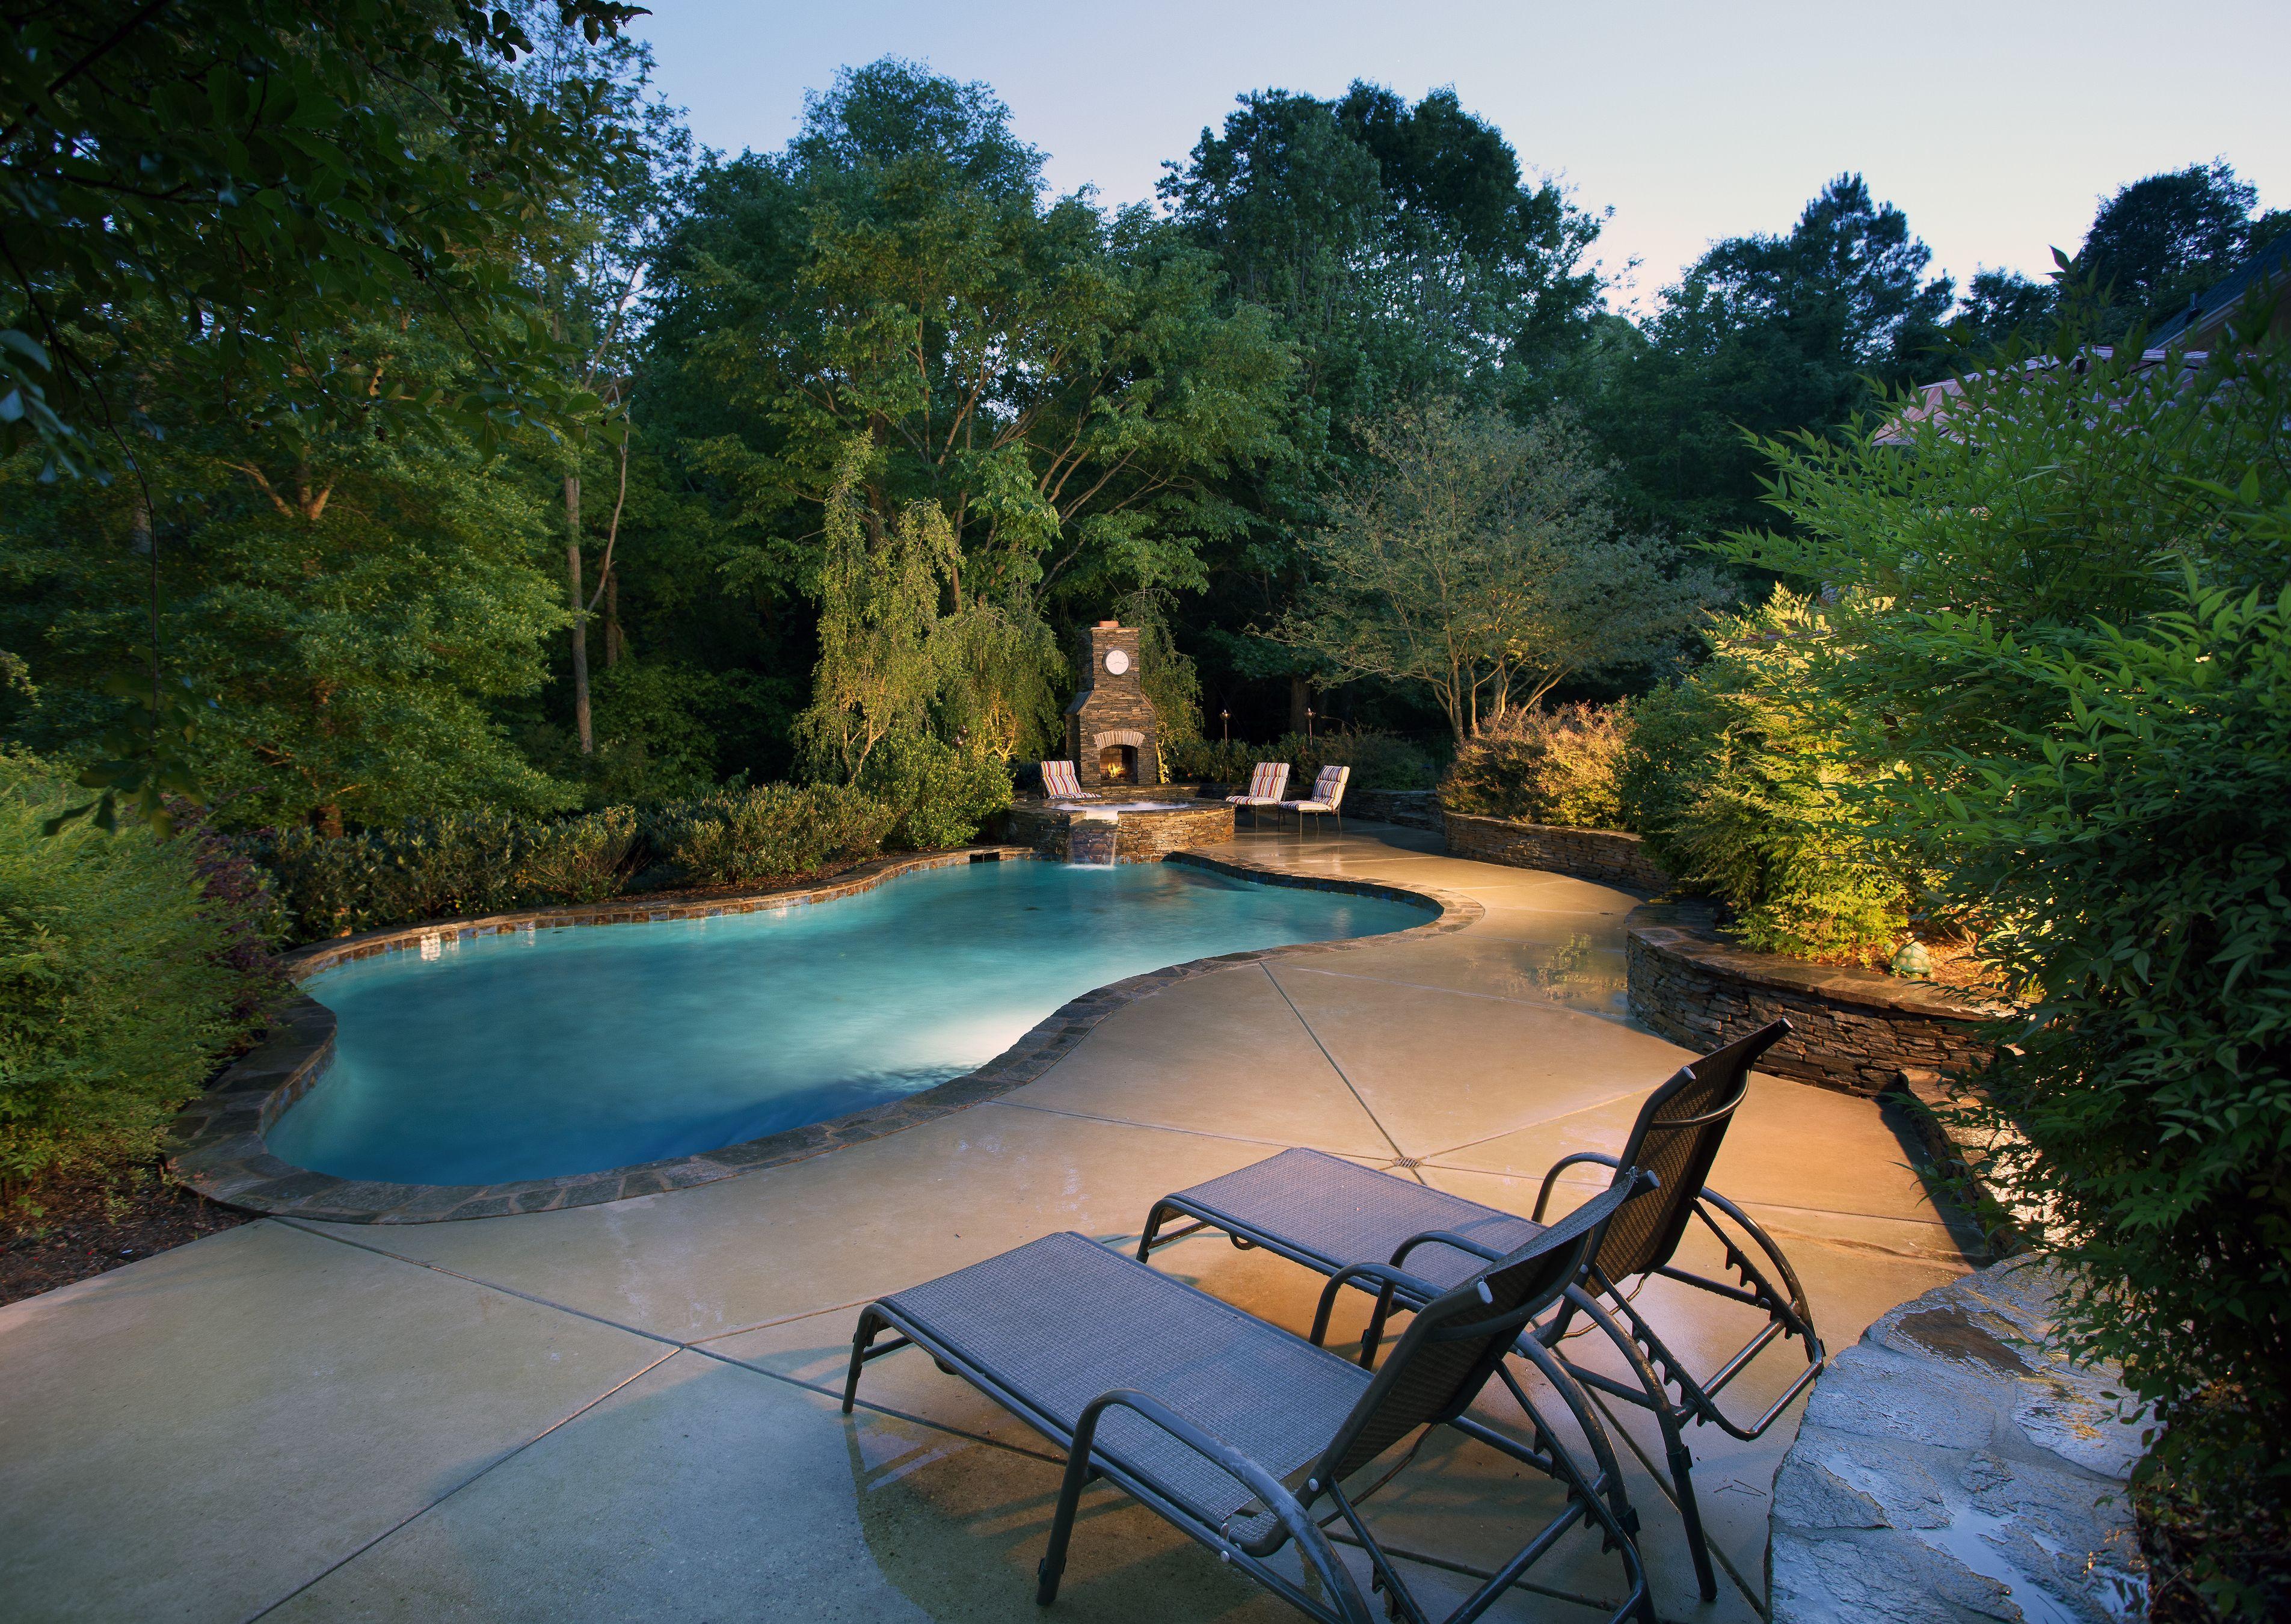 Charlotte Swimming Pools